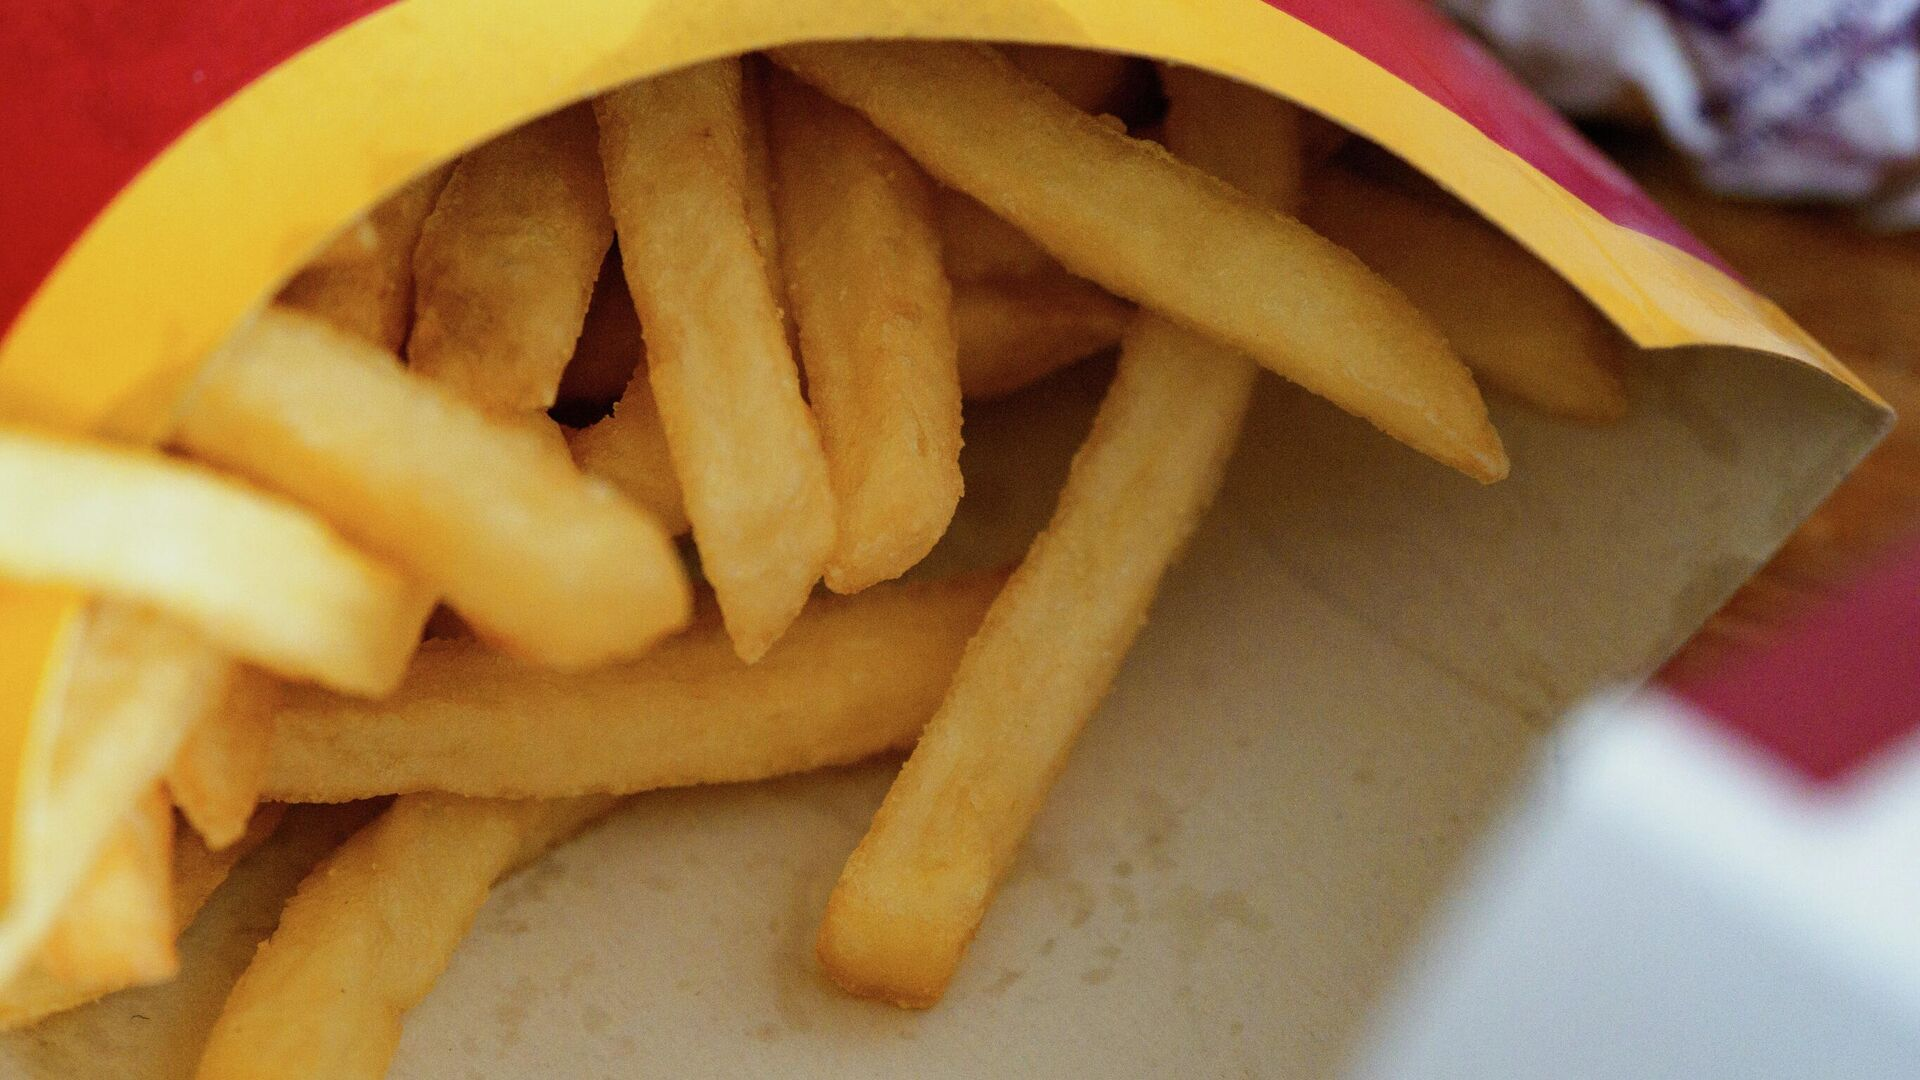 Unas papas fritas de McDonald's - Sputnik Mundo, 1920, 11.06.2021